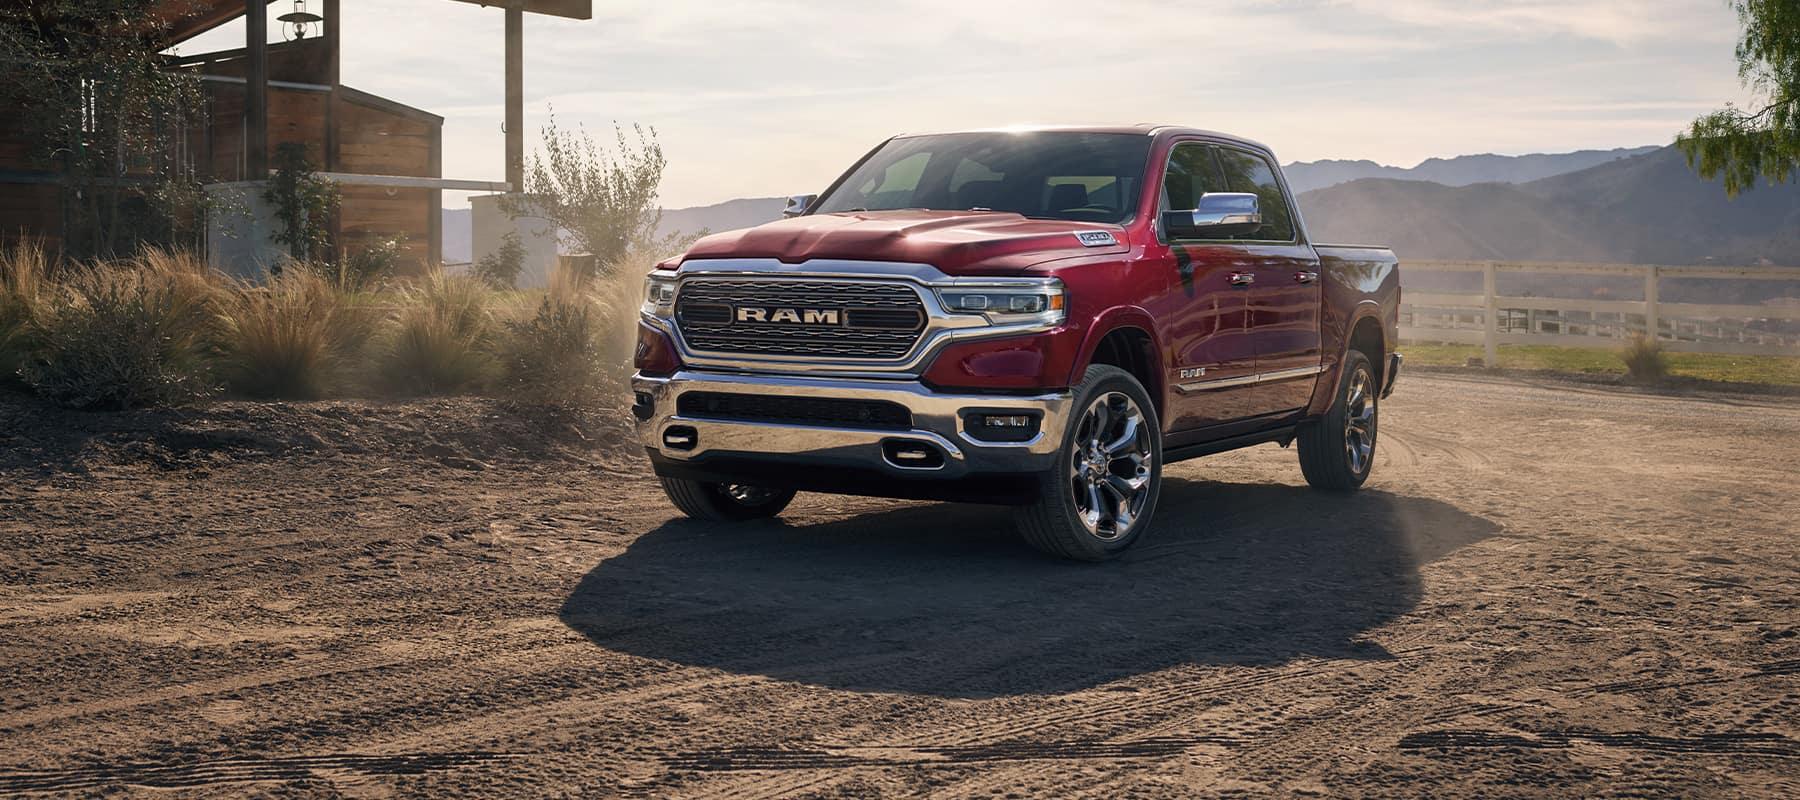 New & Used Dealership | Hendrick Chrysler Dodge Jeep Ram Hoover